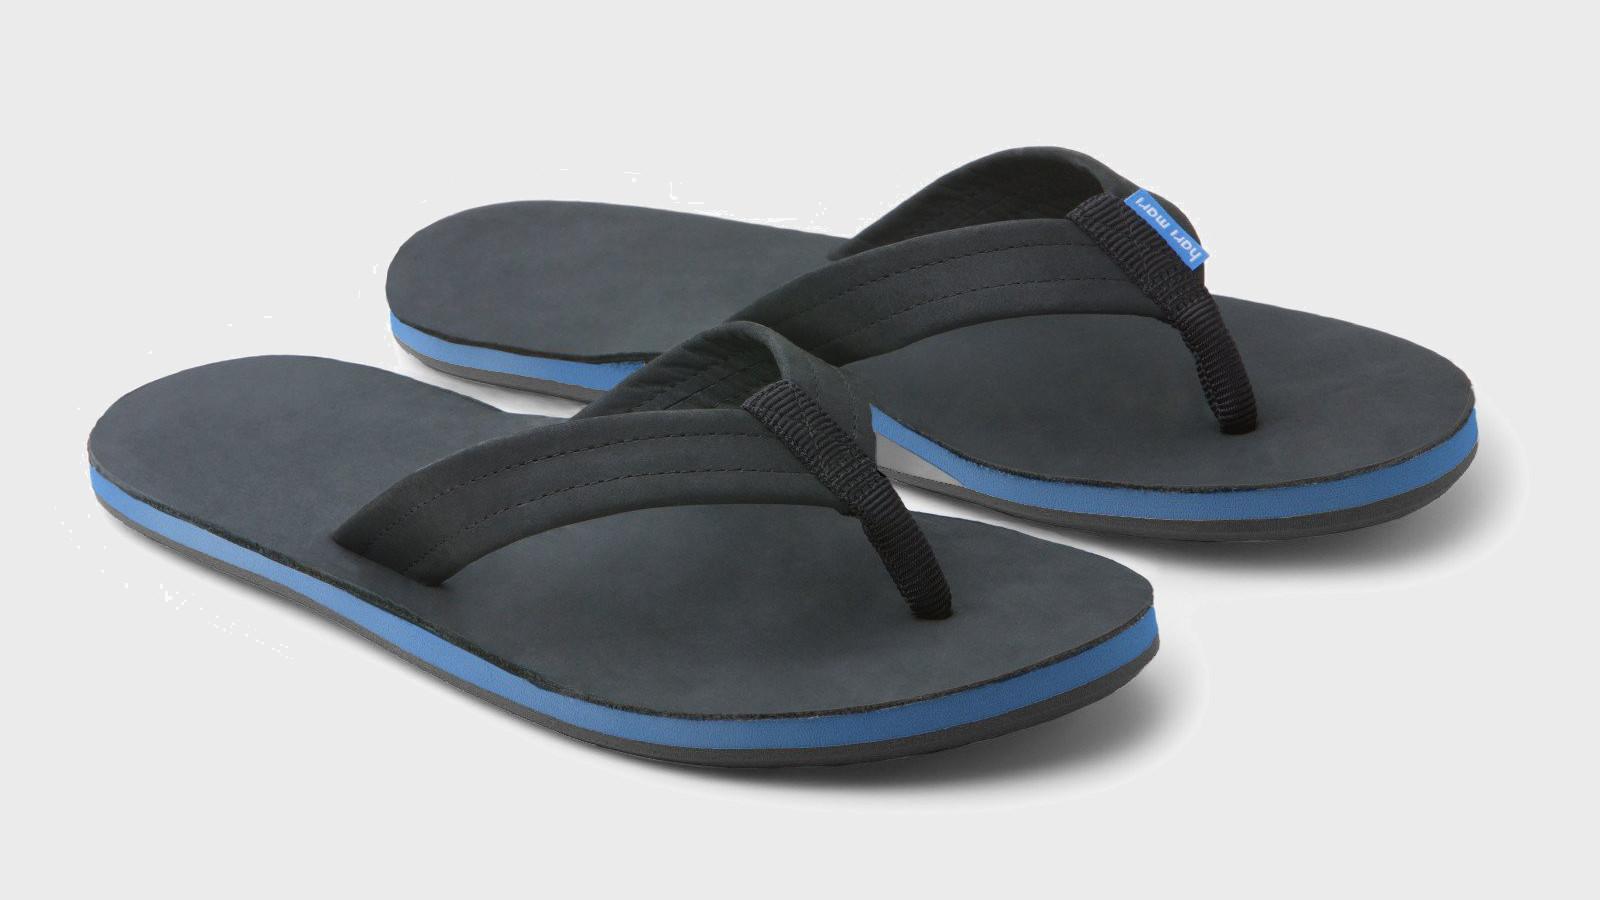 Hari Mari Men's Fields Sandals Blue & Black best sandals for men